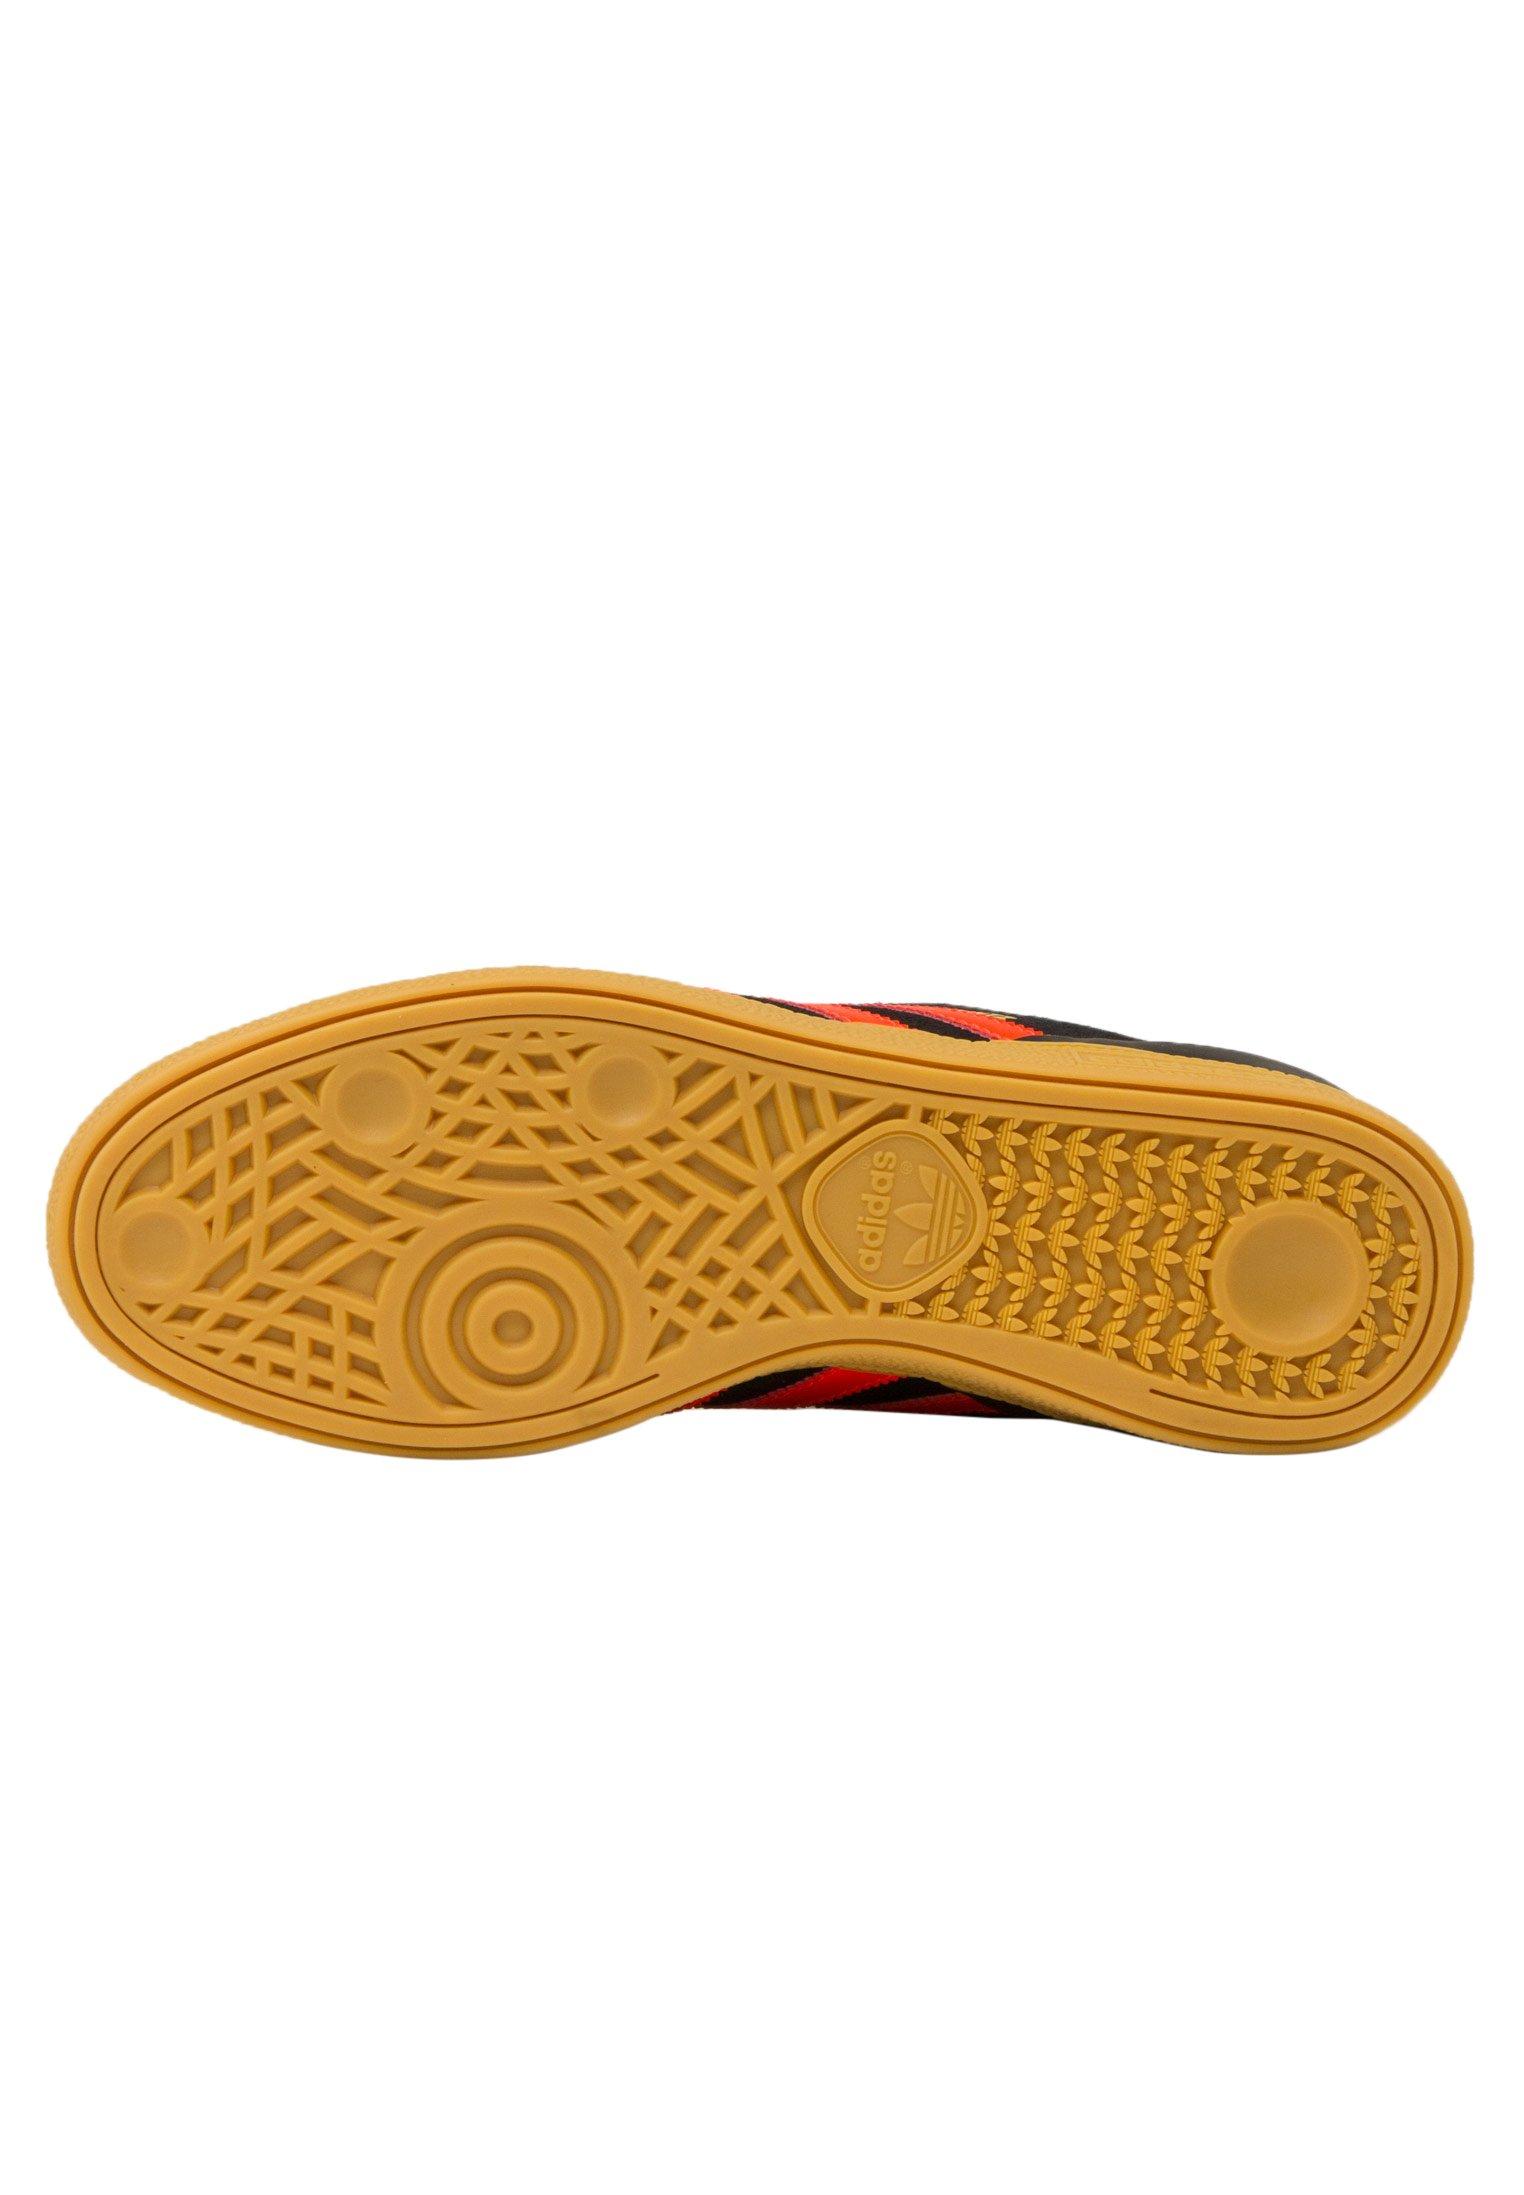 adidas Originals Skateschuh black/red/schwarz